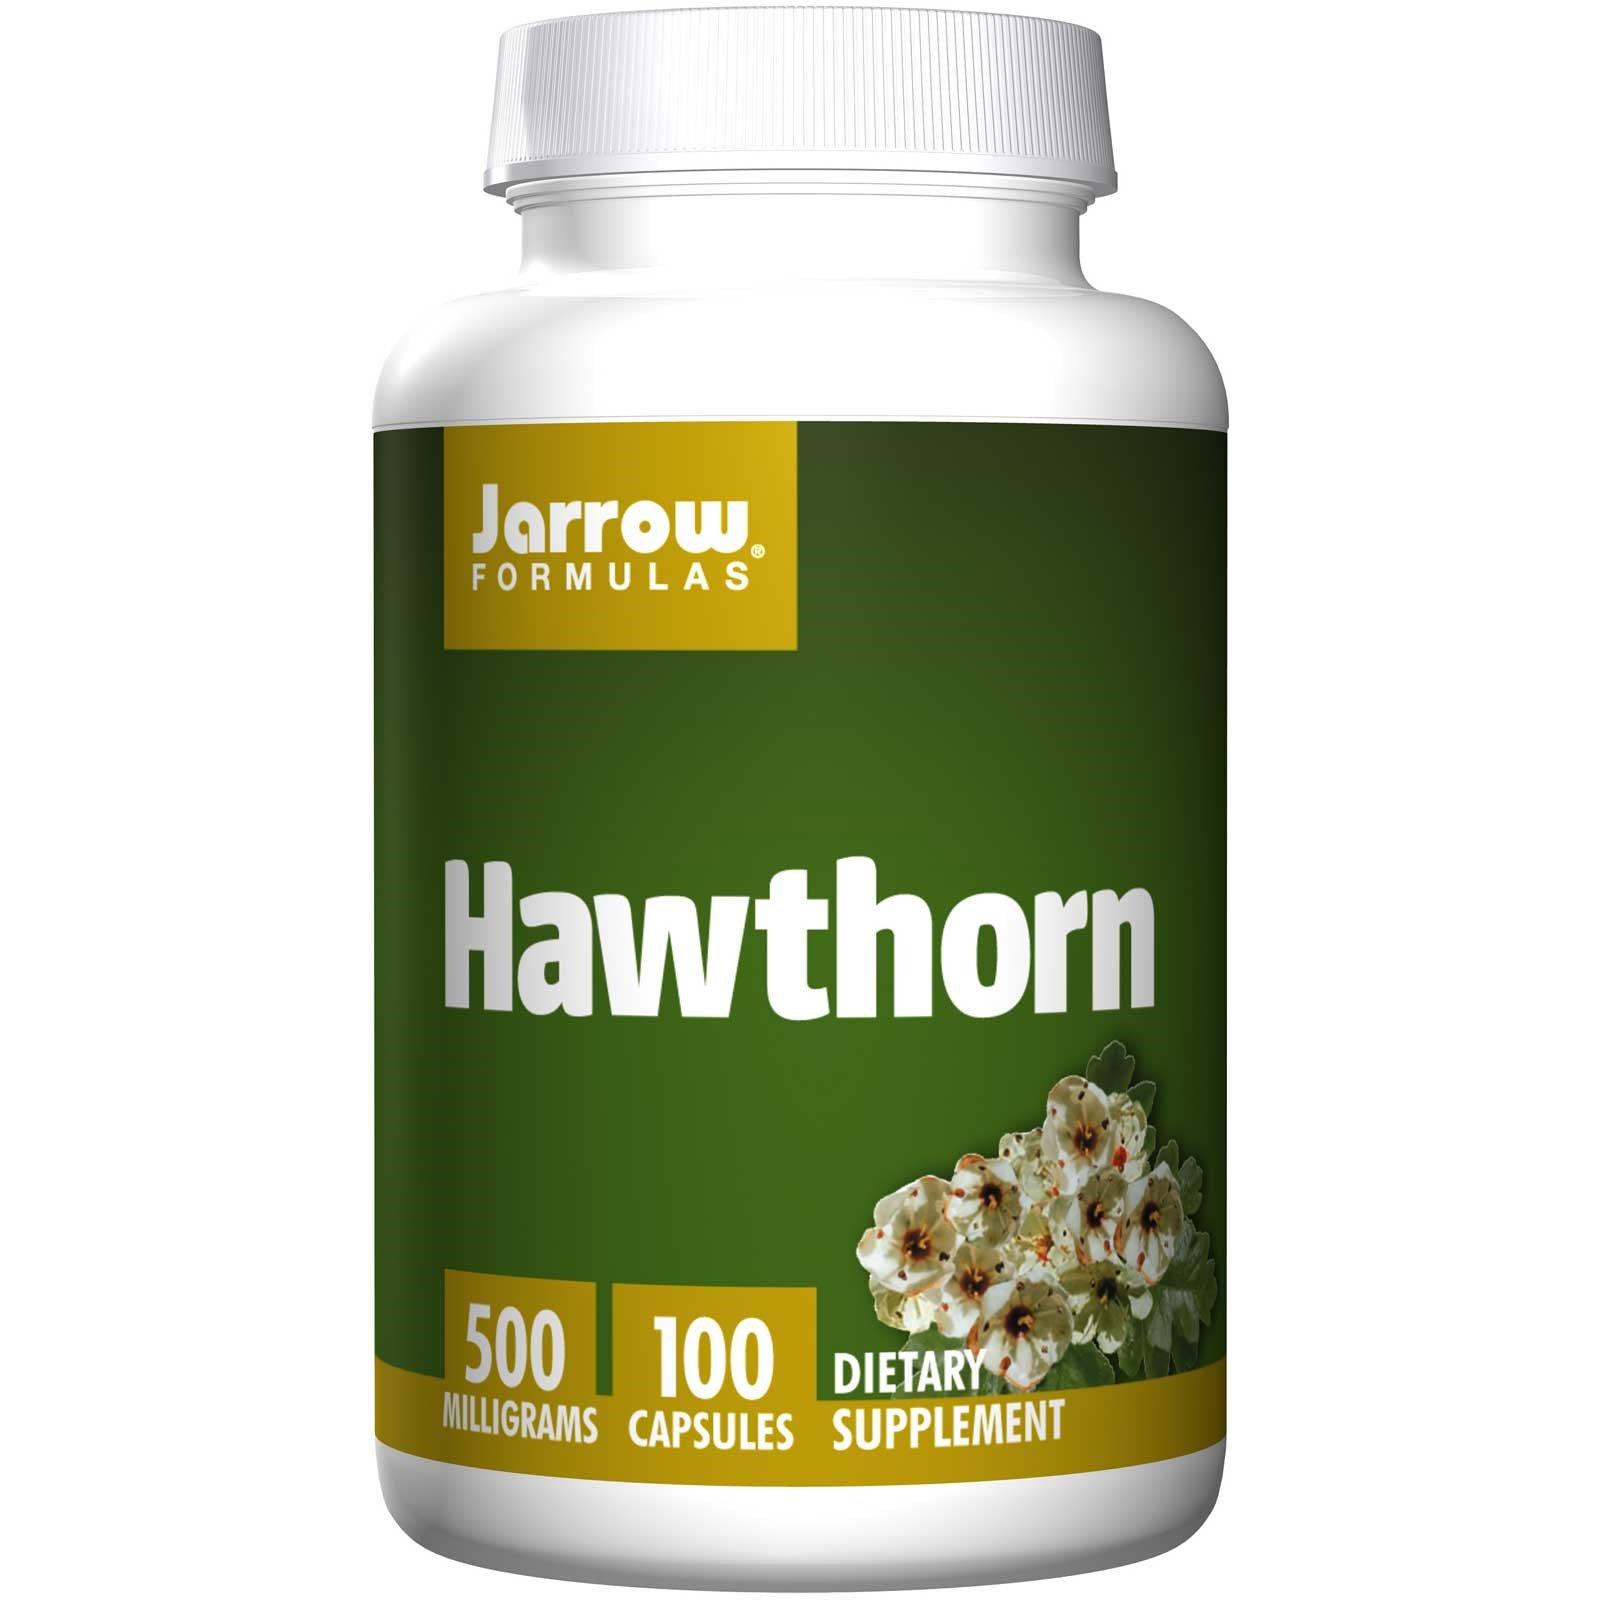 Hawthorn 500 mg (100 Capsules) Jarrow Formulas, Hawthorn (Crataegus oxycantha) has been used for centuries.Extra gegevens:Merk : Jarrow FormulasVerzendkosten : 3.95Levertijd : Vóór 23.00 besteld op werkdagen is morgen in huis.